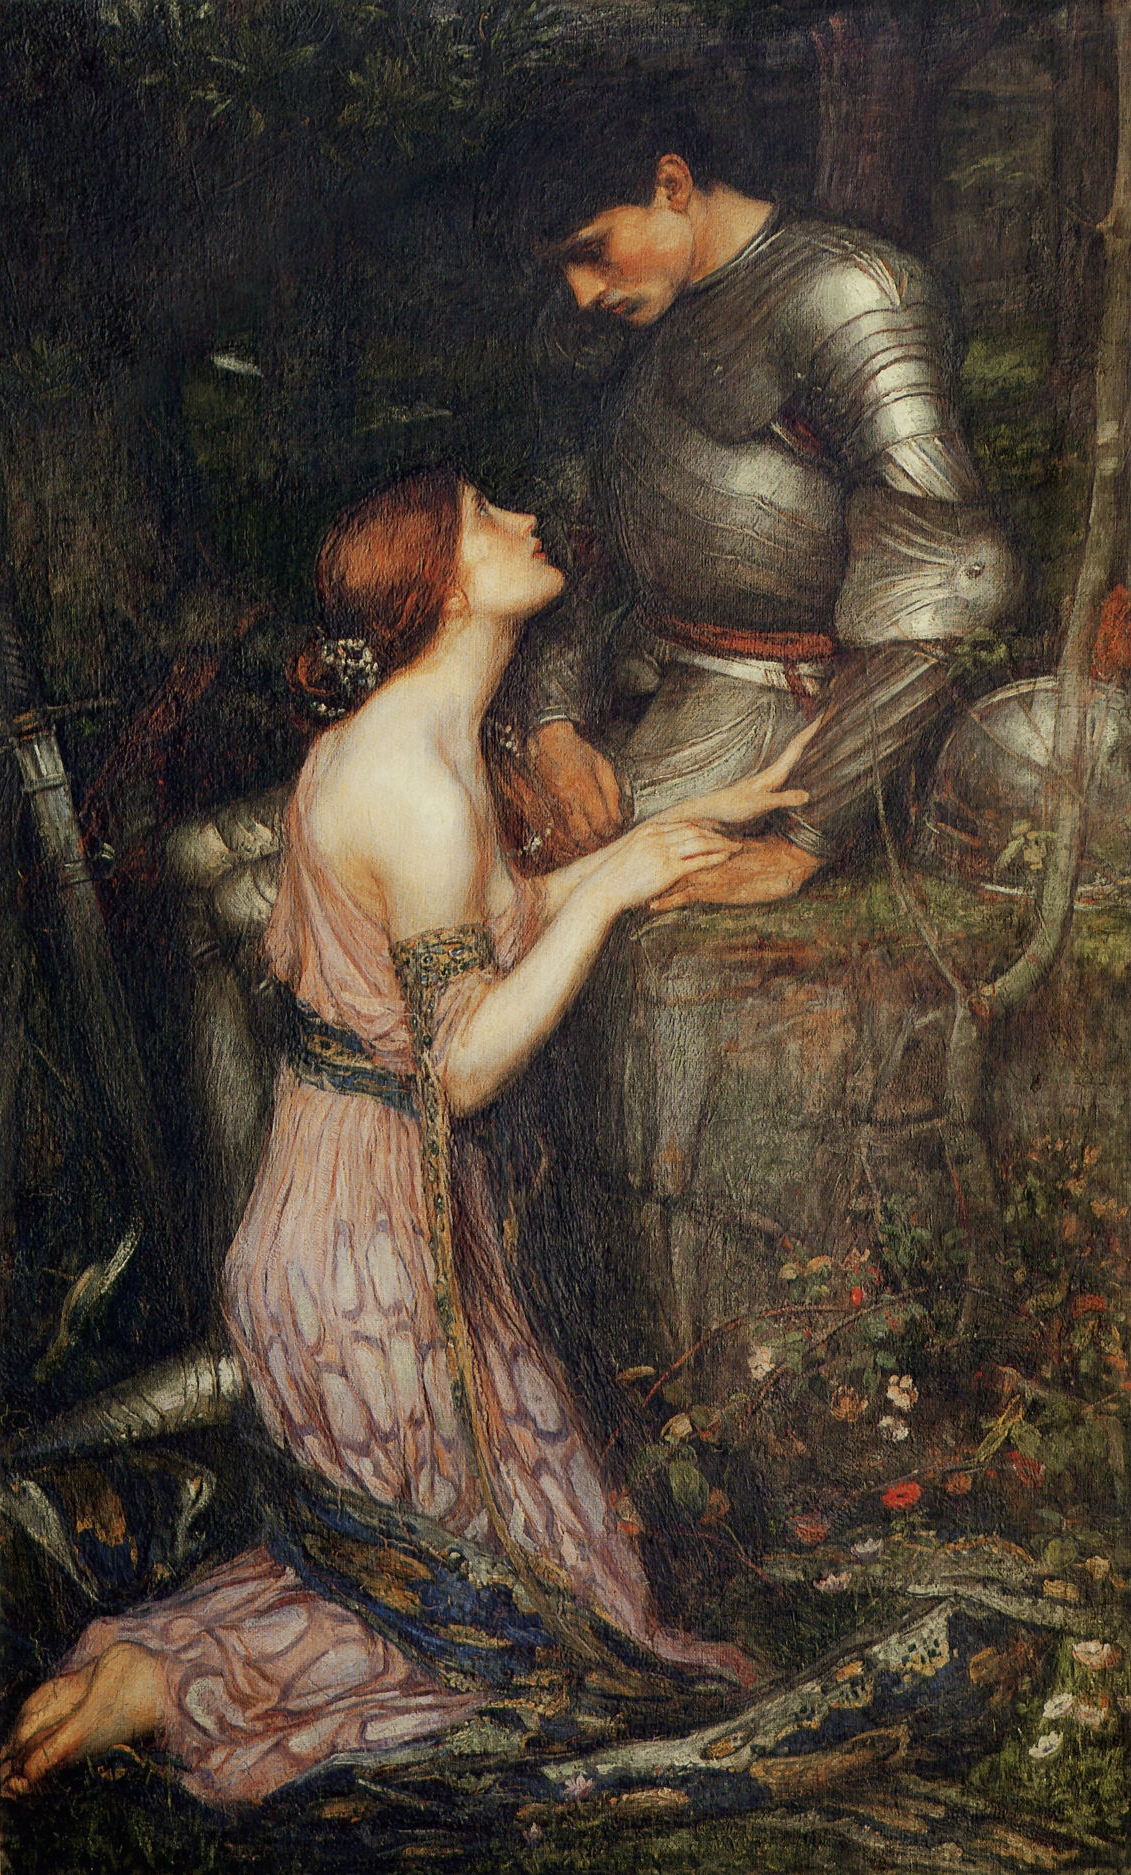 Lamia and the Knight, Waterhouse